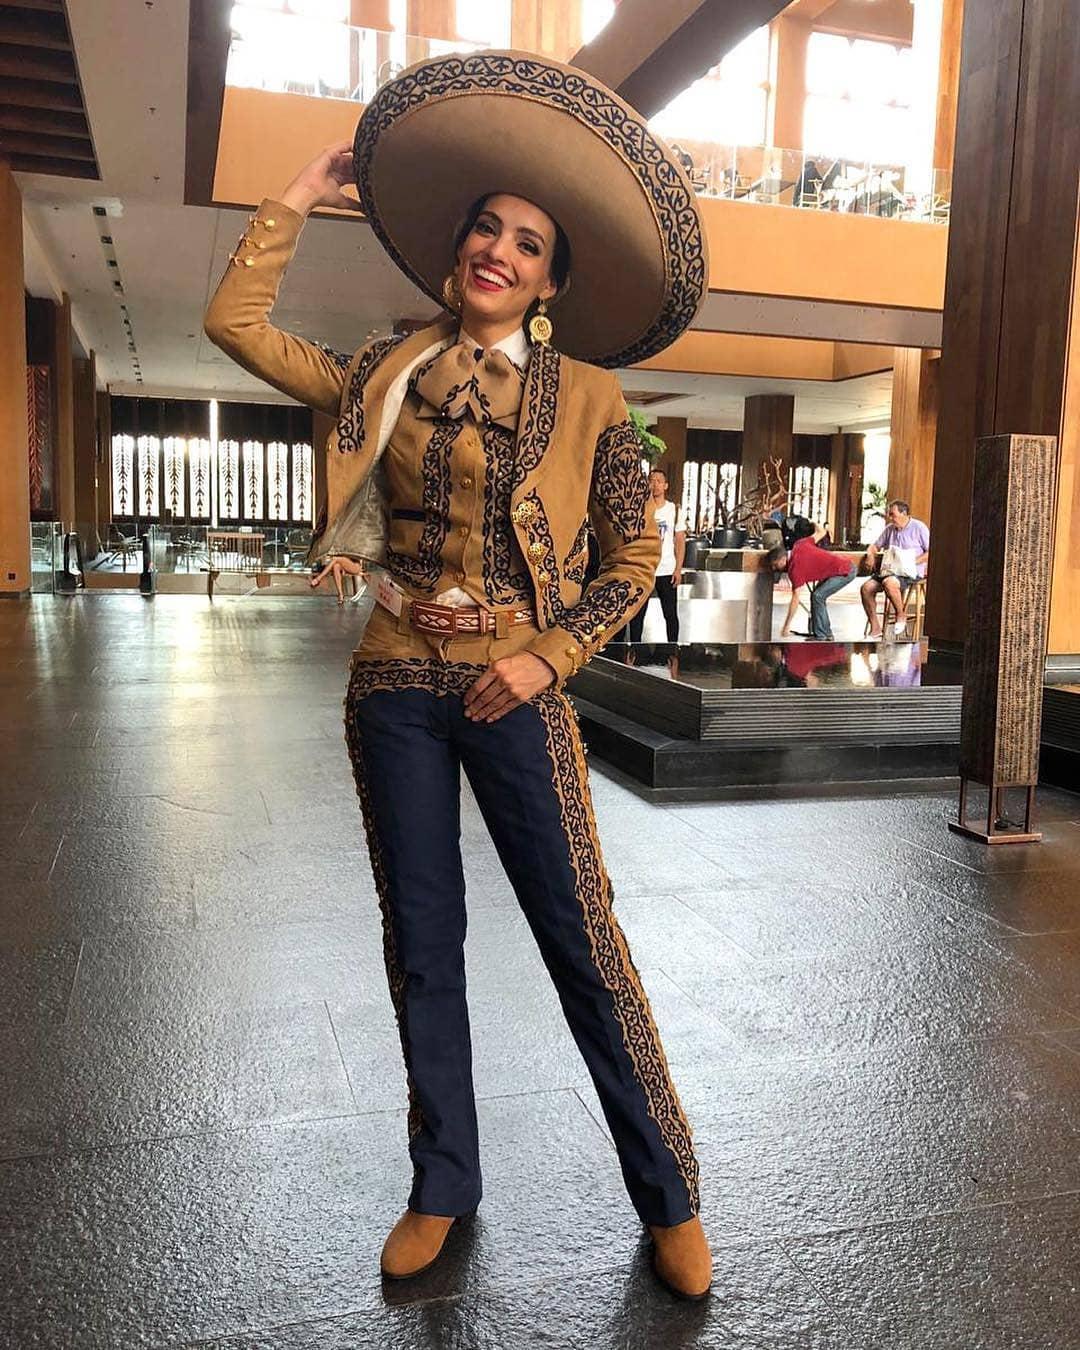 vanessa ponce de leon, miss world 2018. I - Página 6 46124110